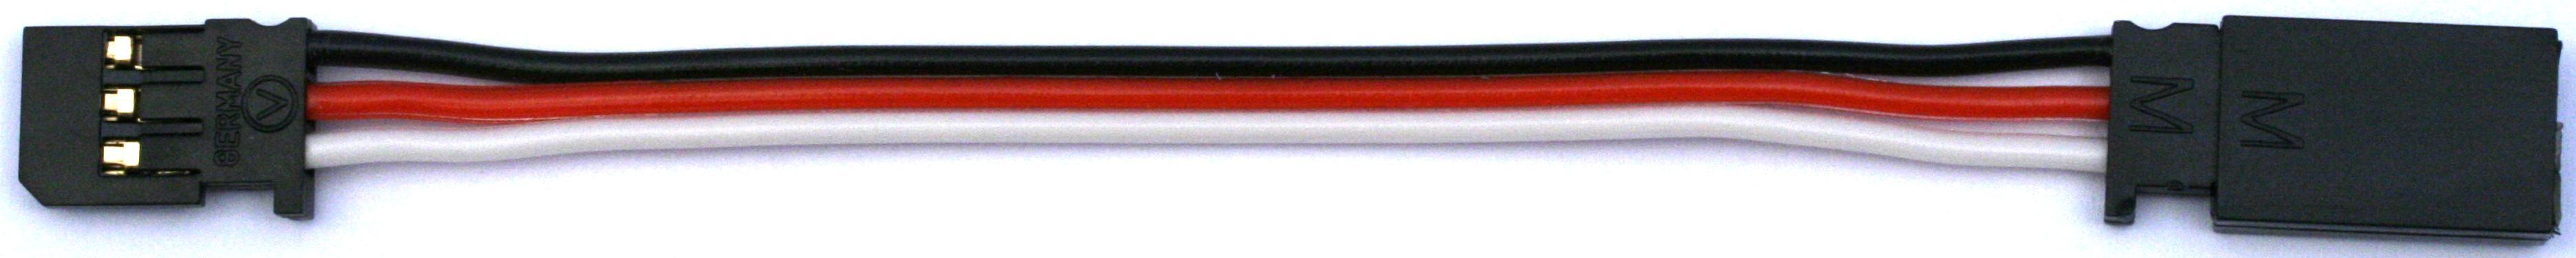 Servokabel Futaba, einzeln verpackt|Servoverlängerungskabel Standard, verpackt1